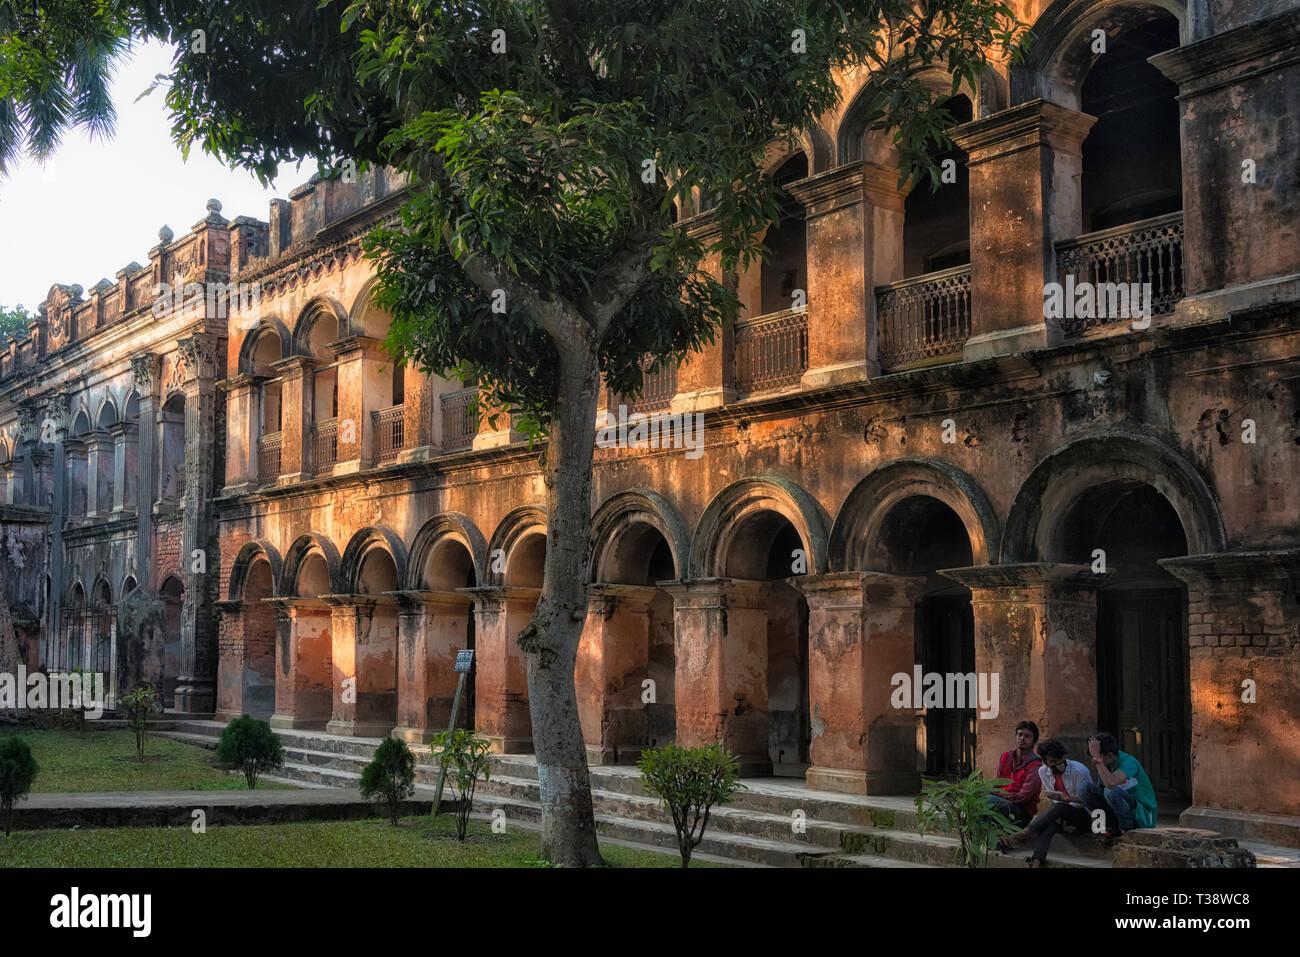 Palazzo Baliati, Divisione di Dhaka, Bangladesh Immagini Stock